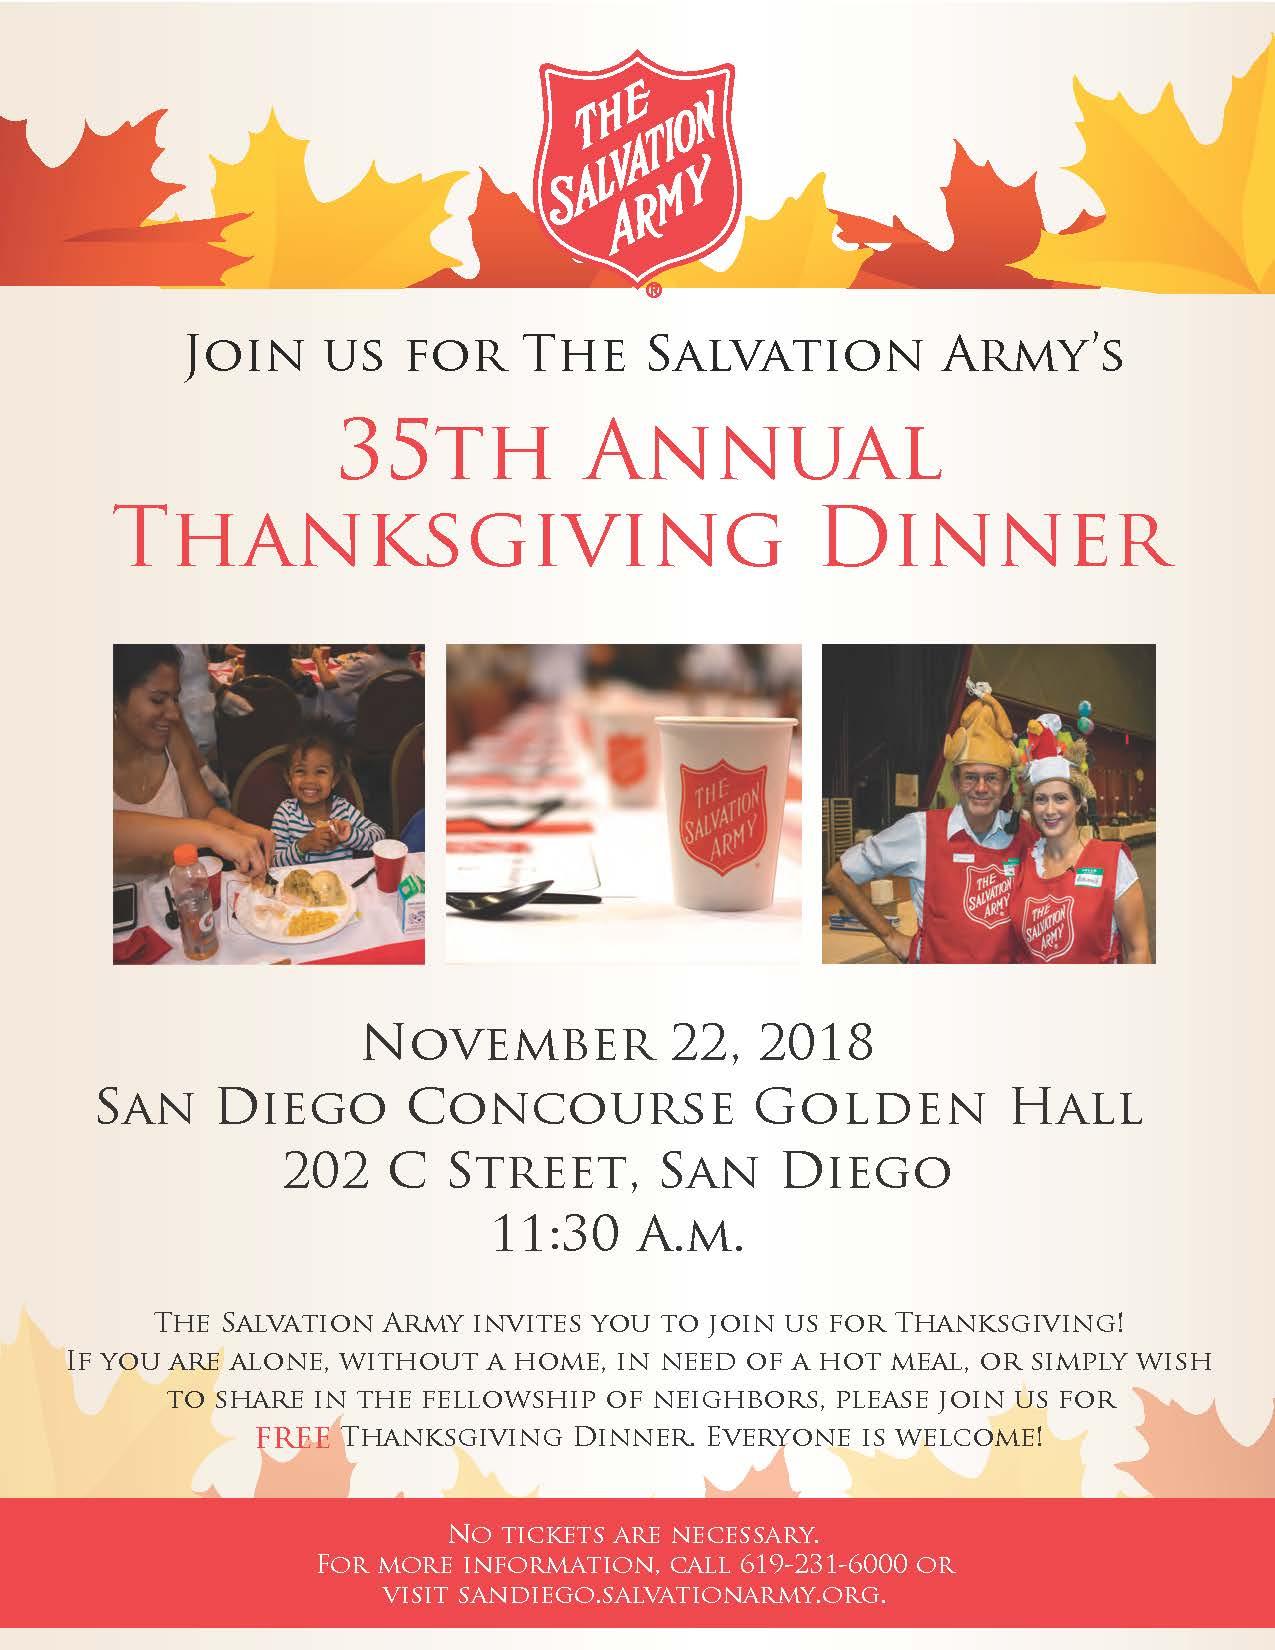 salvation army thanksgiving dinner thursday november 22 2018 11